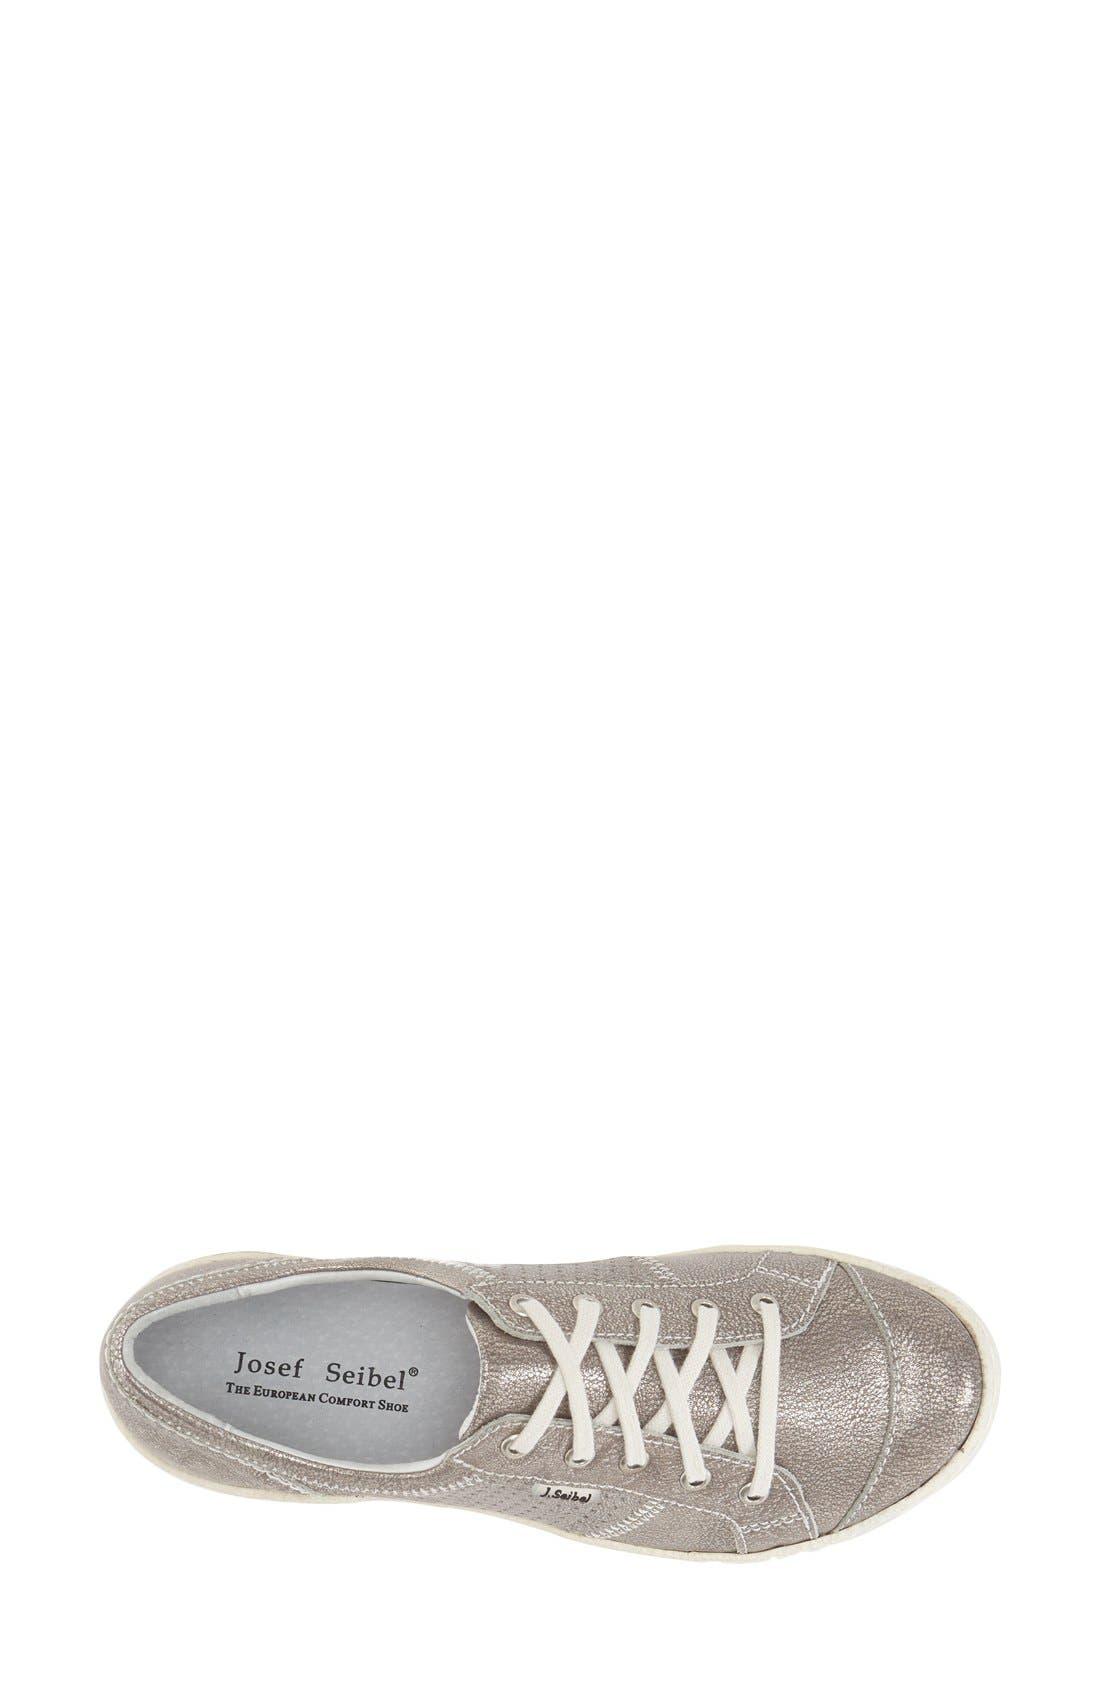 JOSEF SEIBEL, 'Caspian' Sneaker, Alternate thumbnail 3, color, PLATINUM METALLIC LEATHER